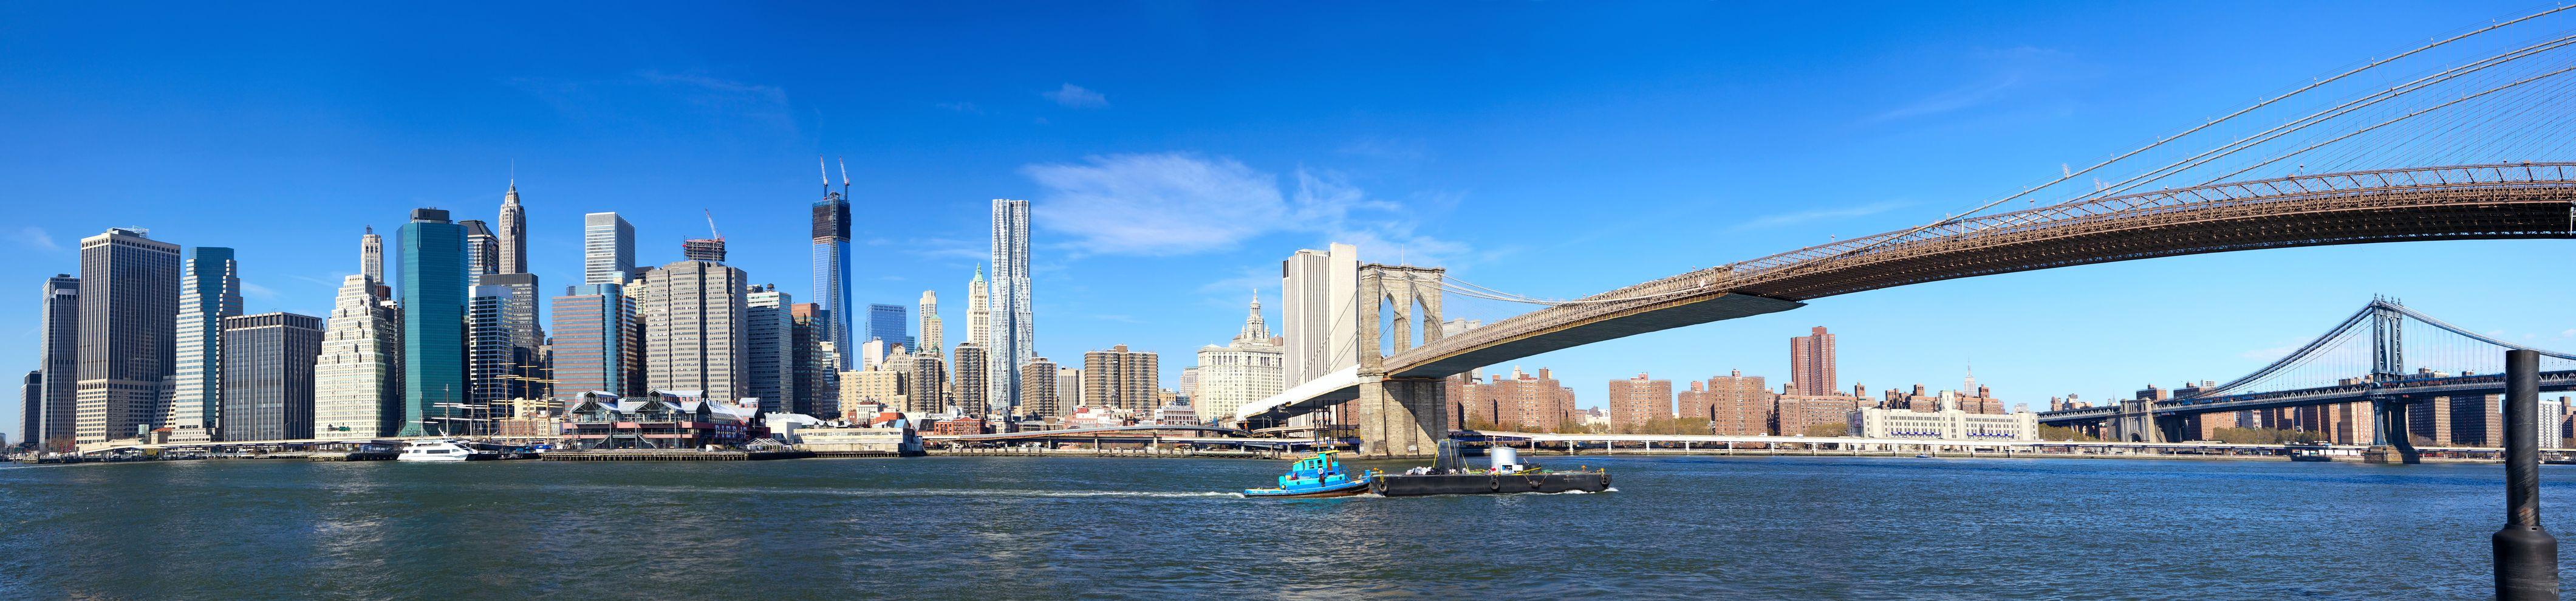 New York City Cruise Ship Injury Attorney